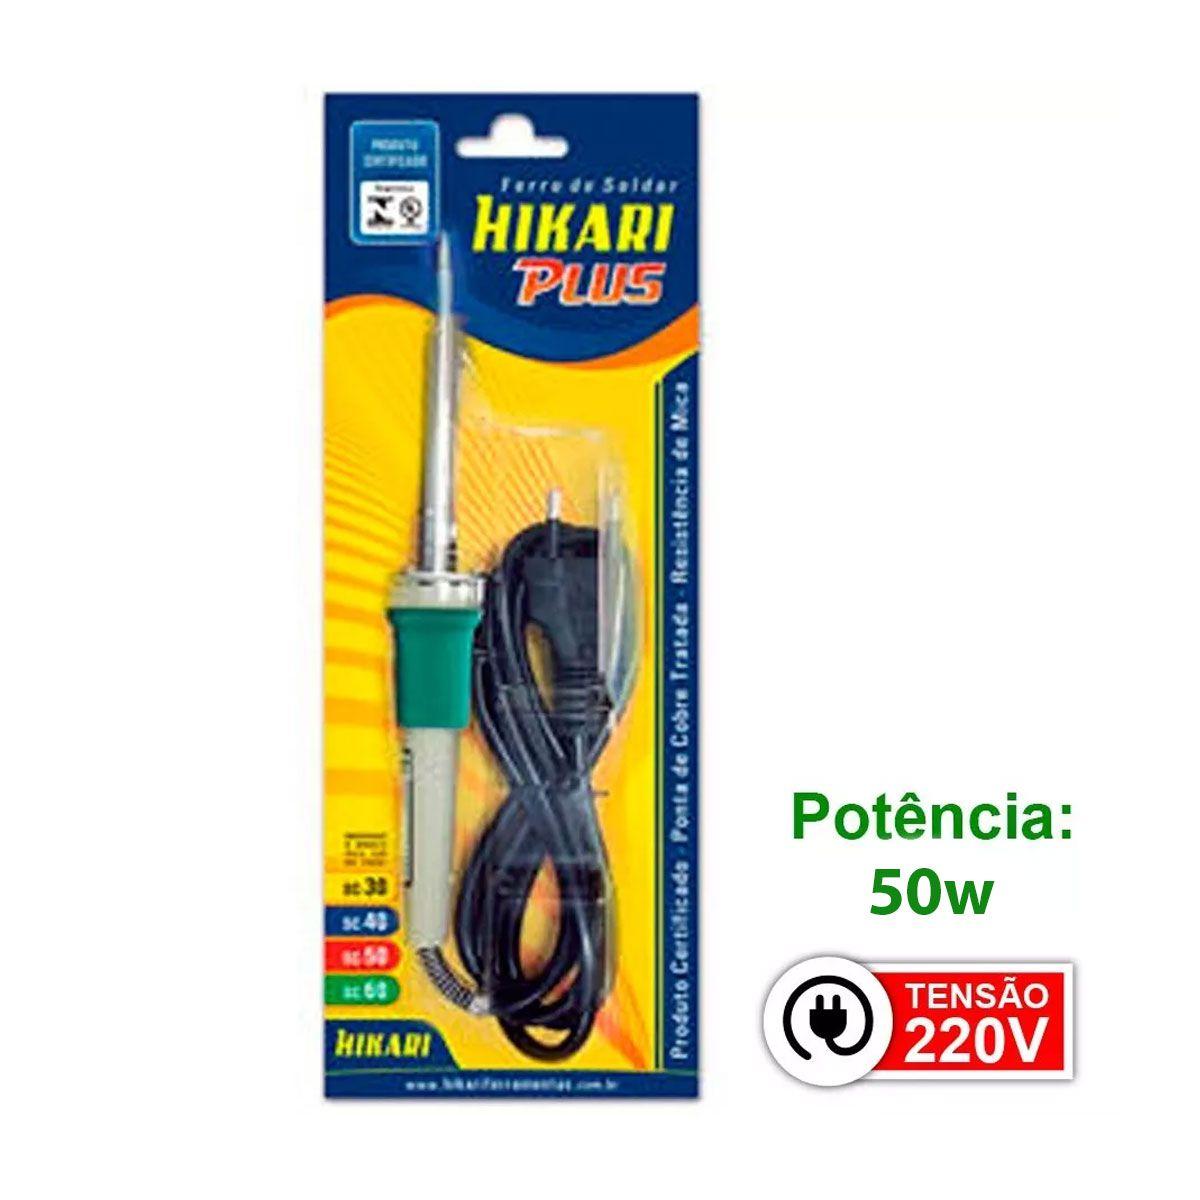 Ferro de Solda HK Plus Hikari Profissional SC-60 50W 220v